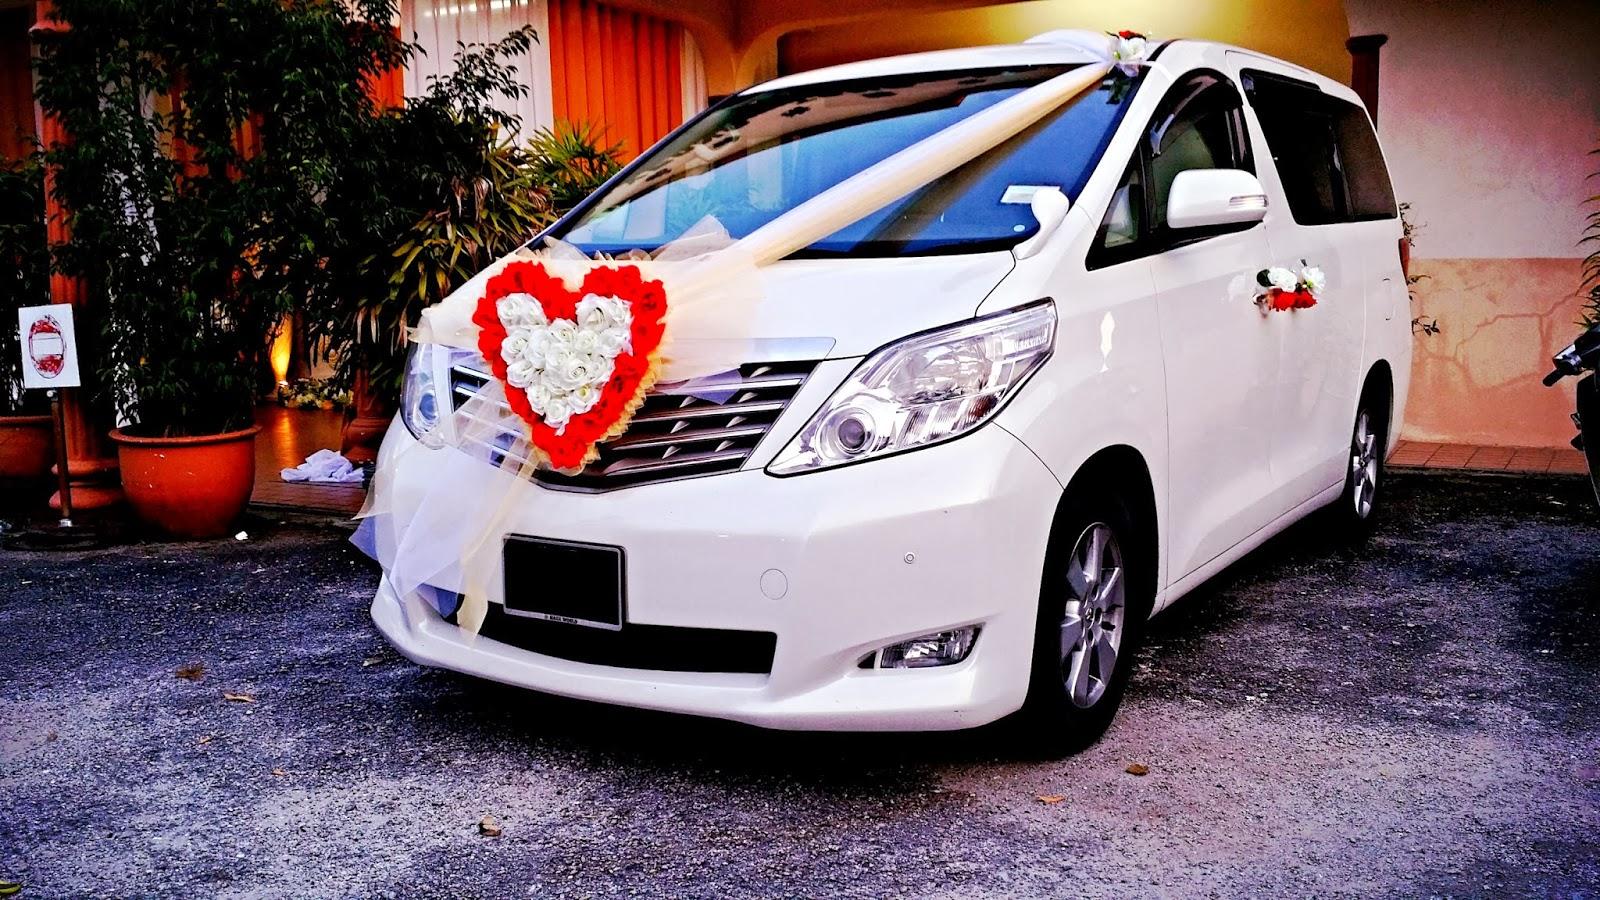 Luxury Vehicle: RedOrca Malaysia Wedding And Event Car Rental: Wedding Car